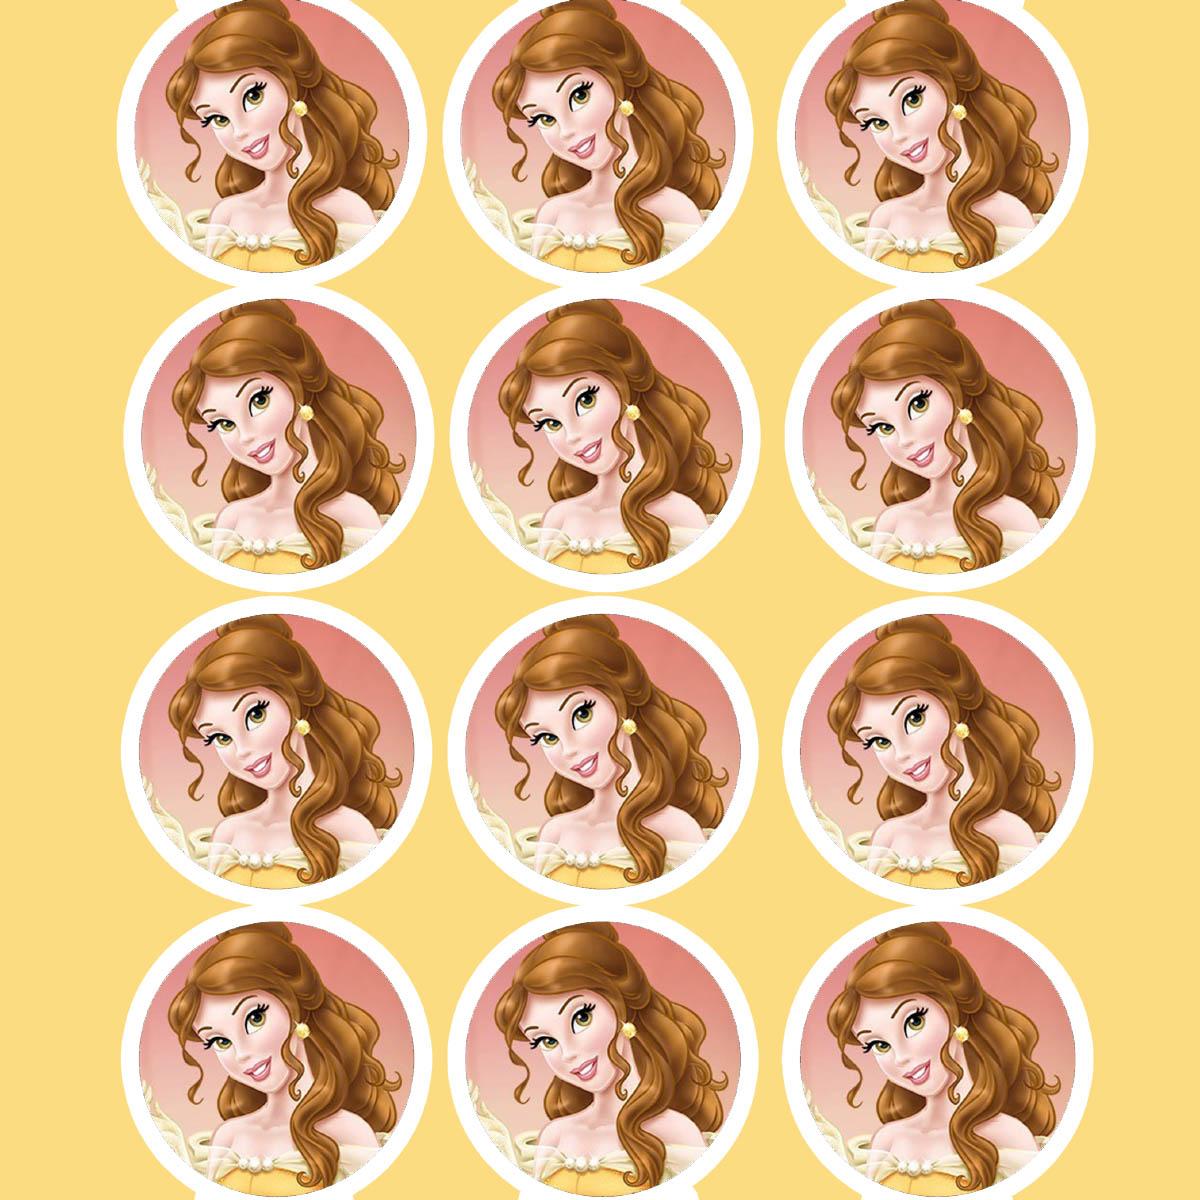 Disney Princess Birthday Party Printable Files Daisy Celebrates